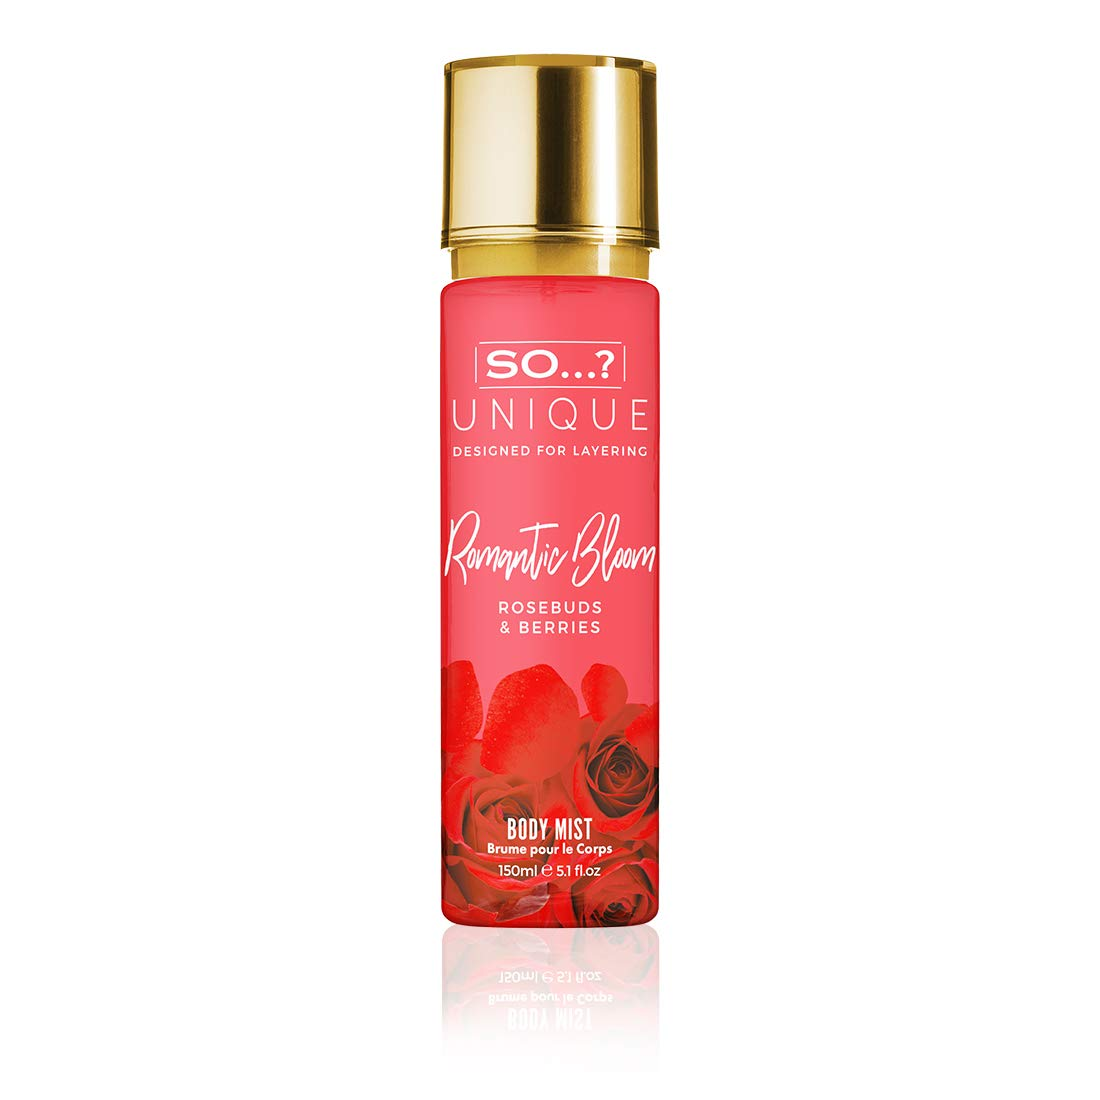 So.? Unique Romantic Bloom Body Mist, 150 ml 90215